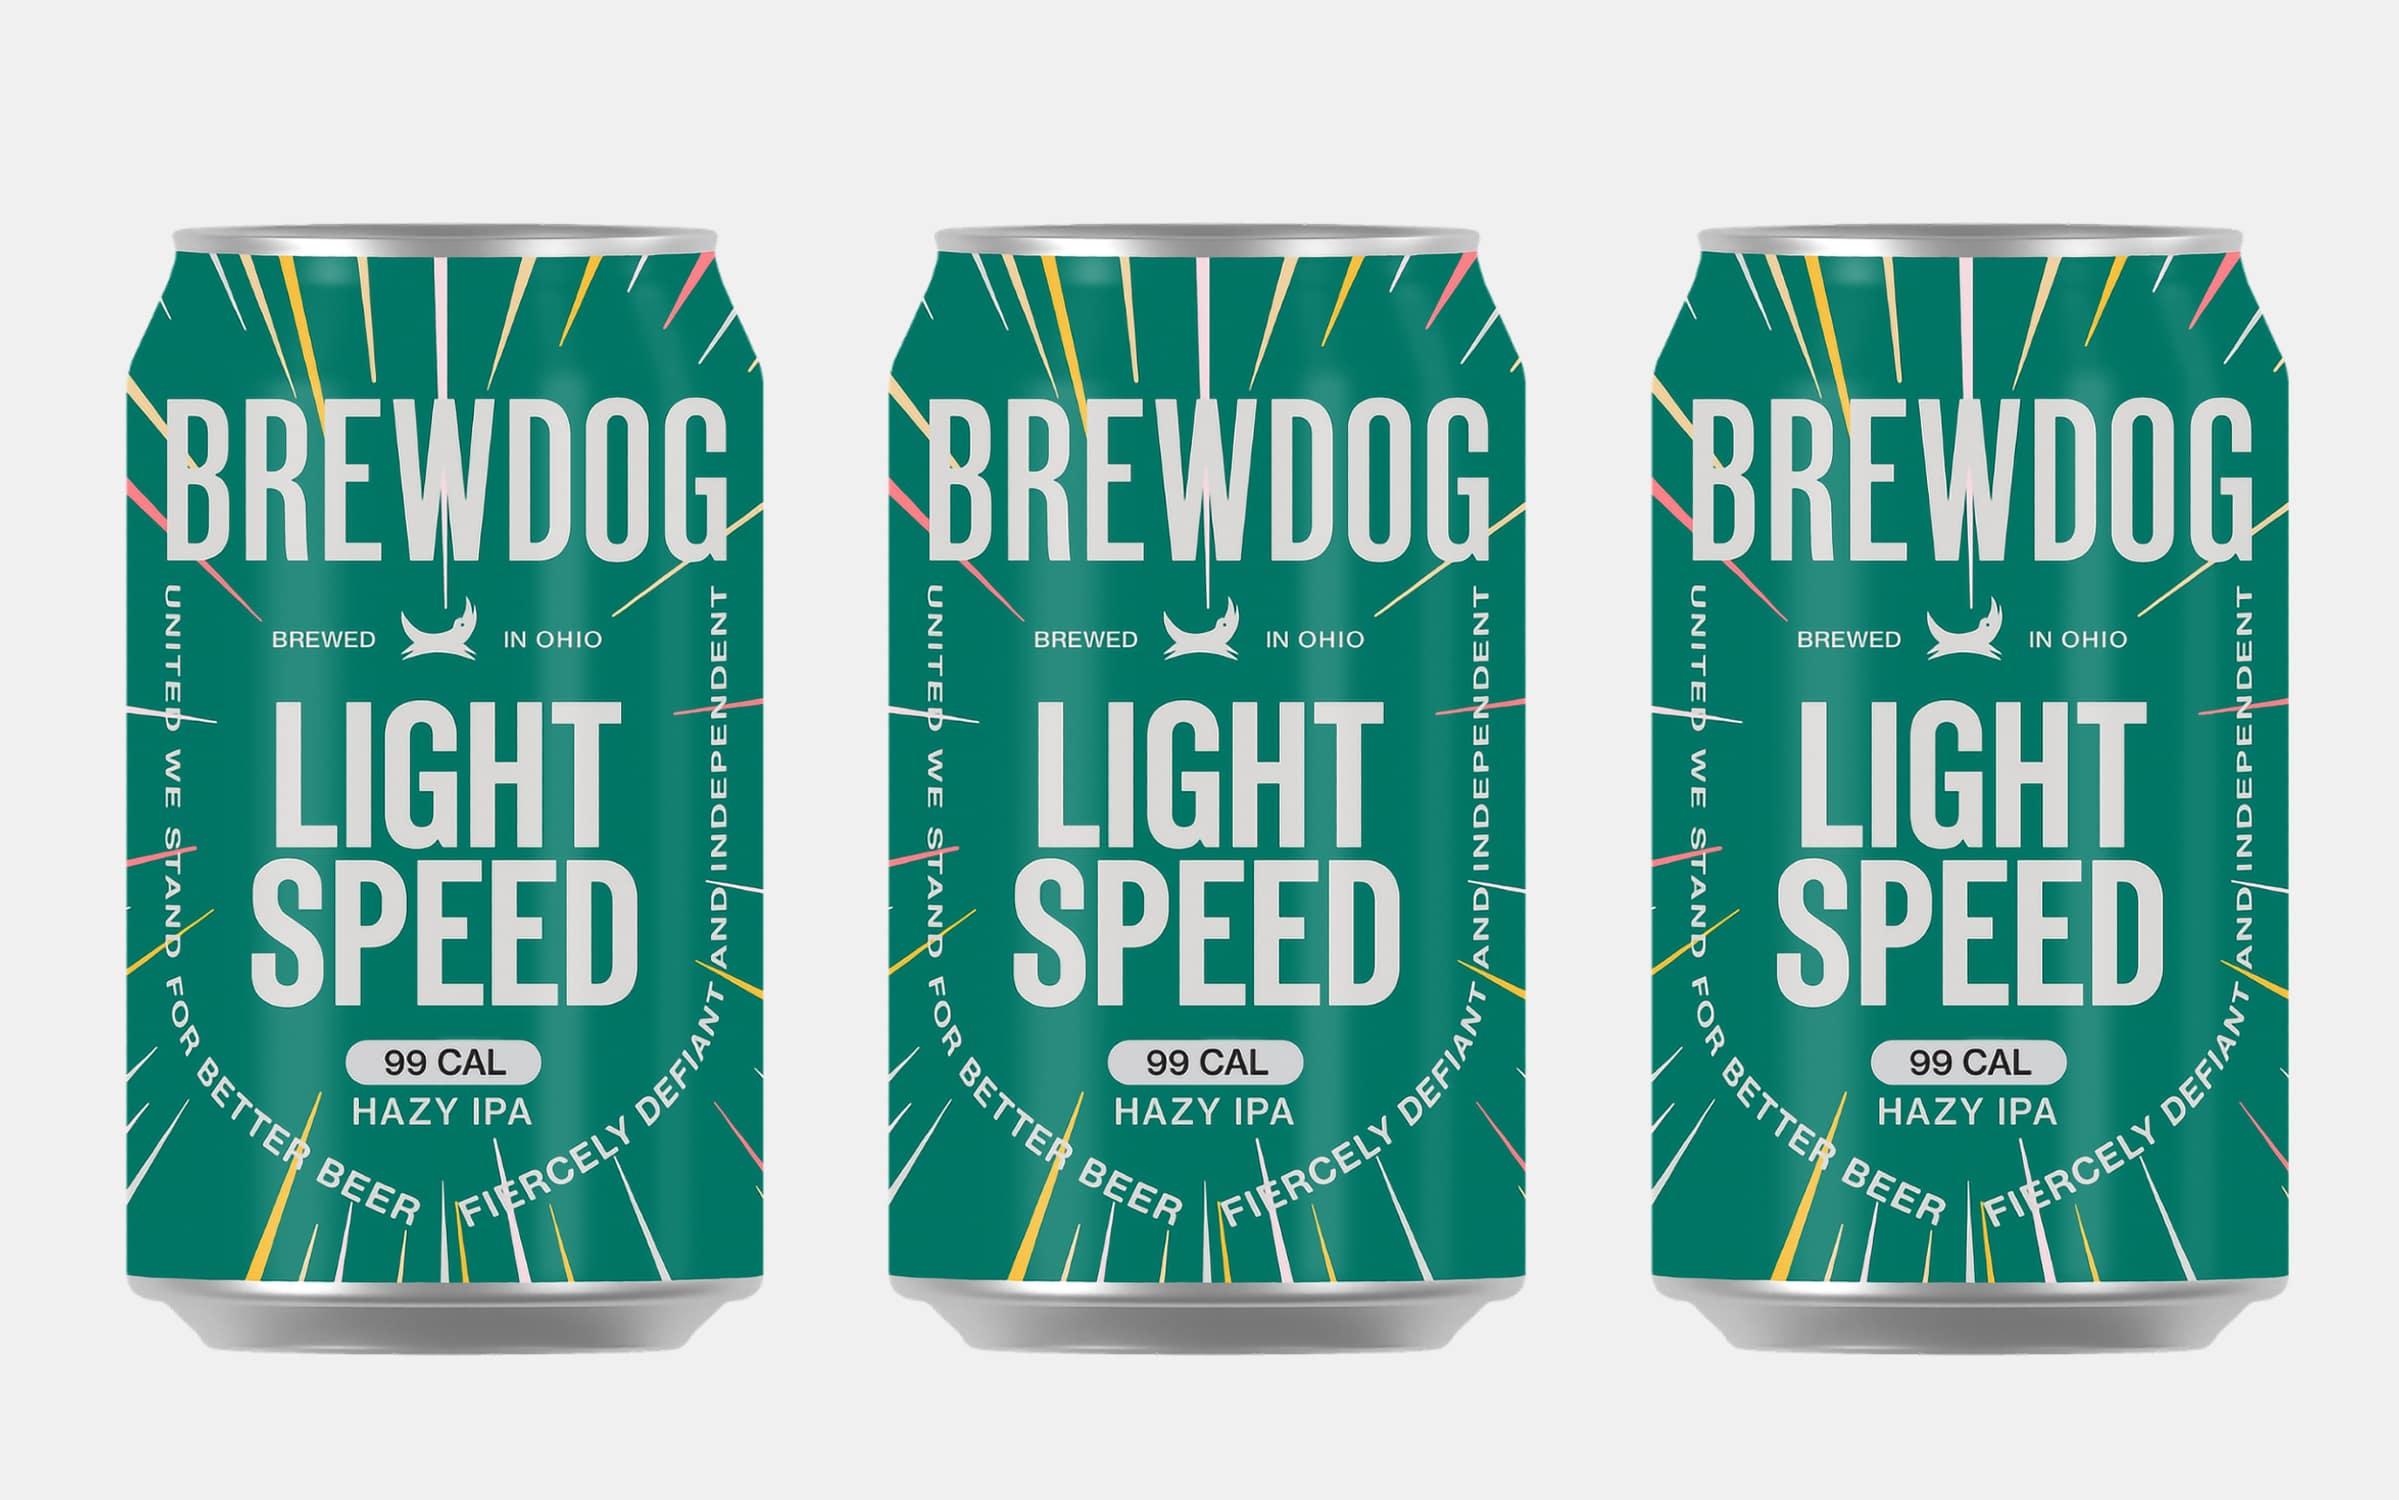 BrewDog Lightspeed Hazy IPA